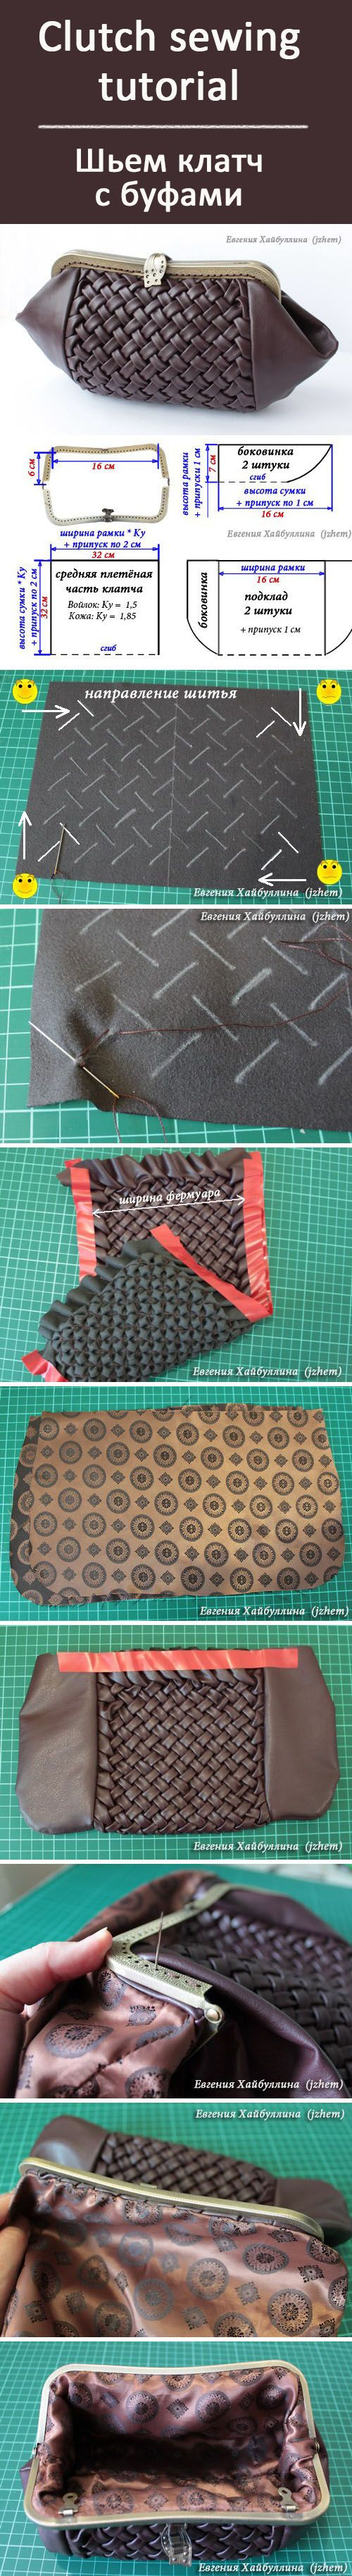 Шьем клатч с буфами и фермуаром  #sewing #diy #handmade #МК #ручнаяработа #inspiration